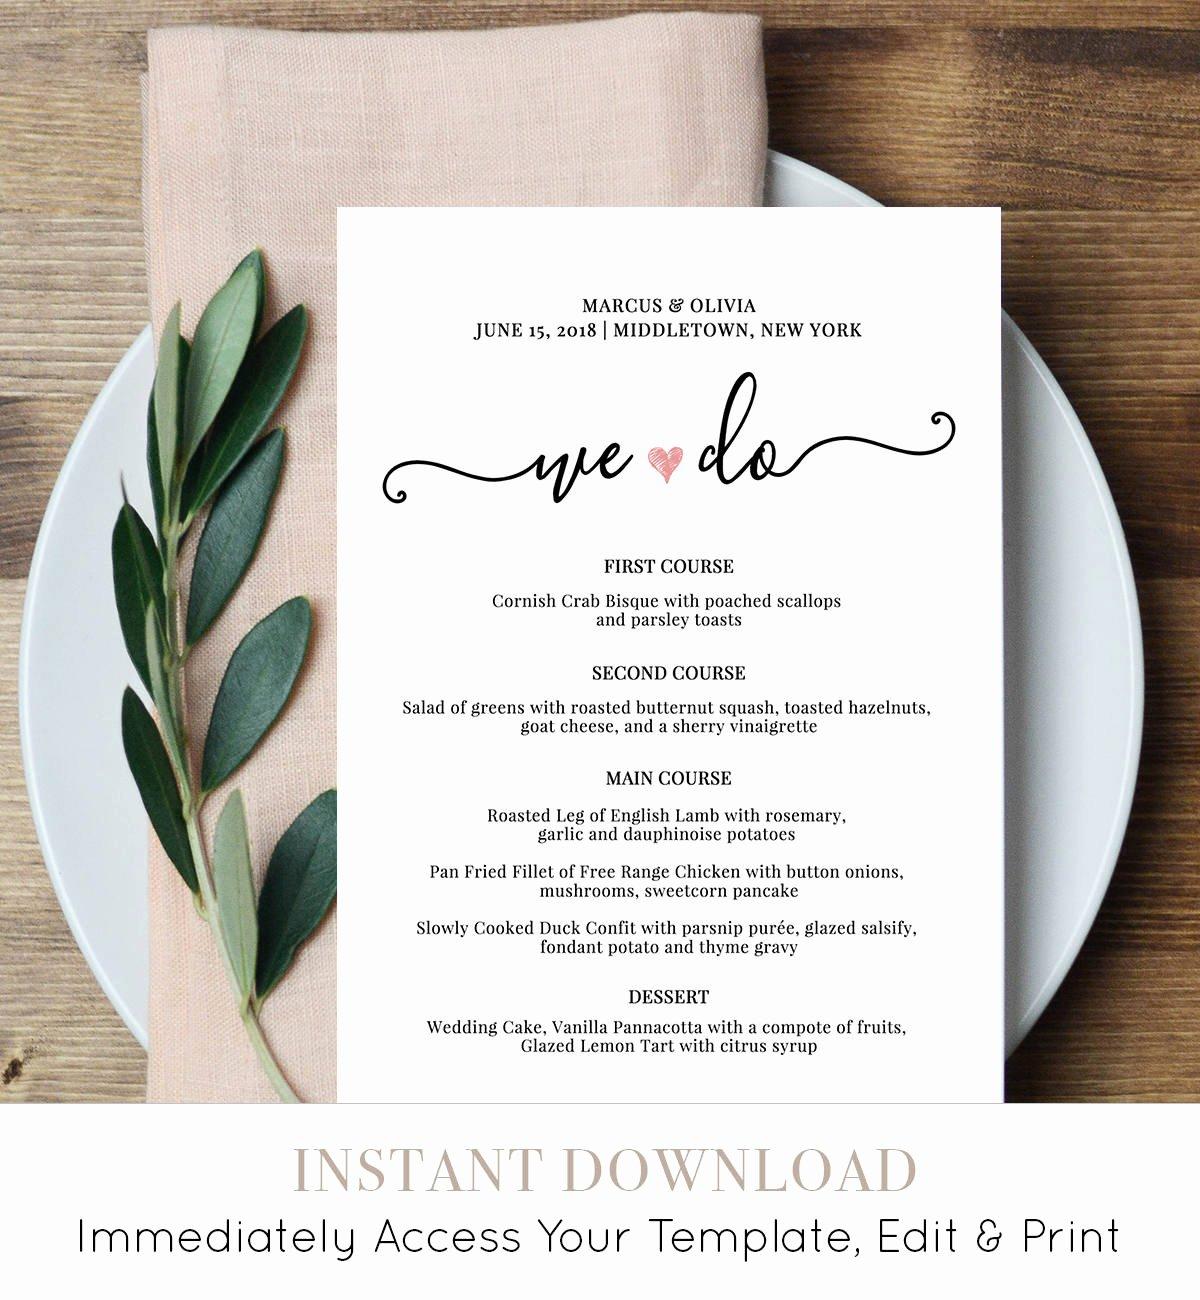 Wedding Reception Menu Template Luxury Wedding Menu Card Template We Do Printable Dinner Menu